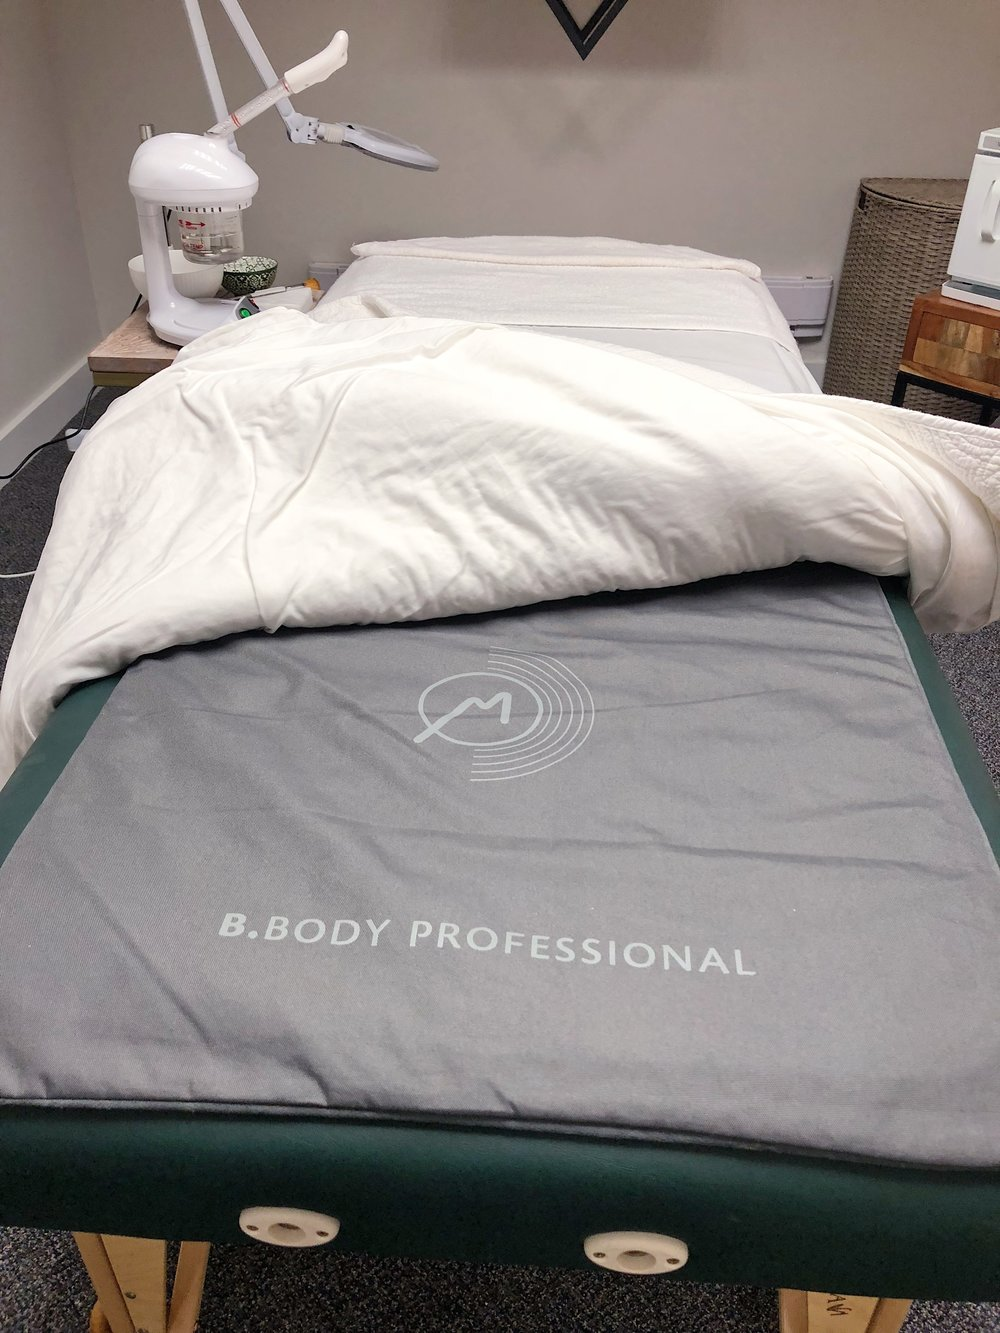 bgw - b body table.JPG